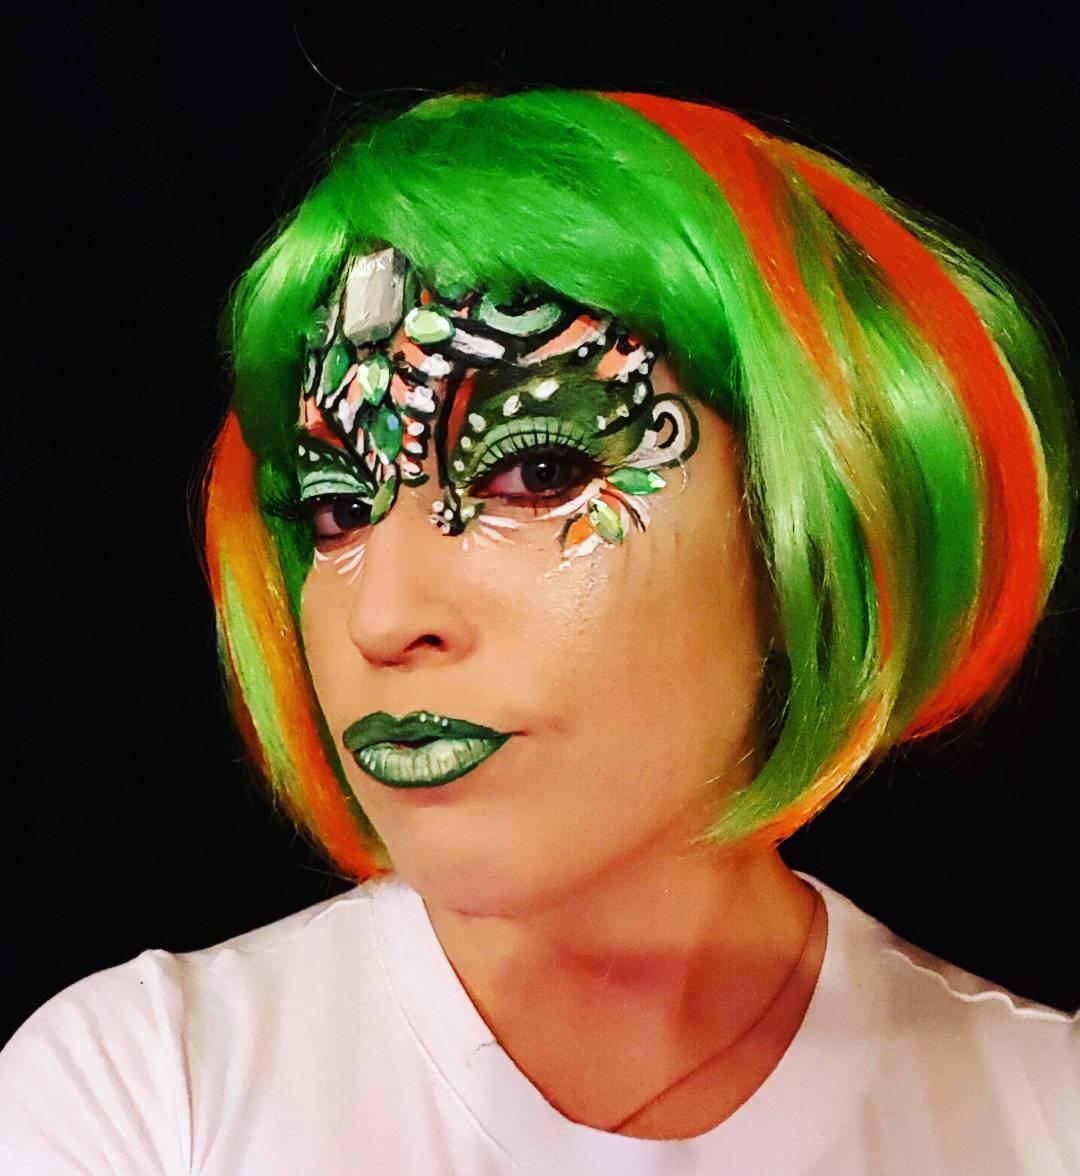 20+ Funny Makeup Designs, Trends, Ideas | Design Trends Simple Clown Makeup Men